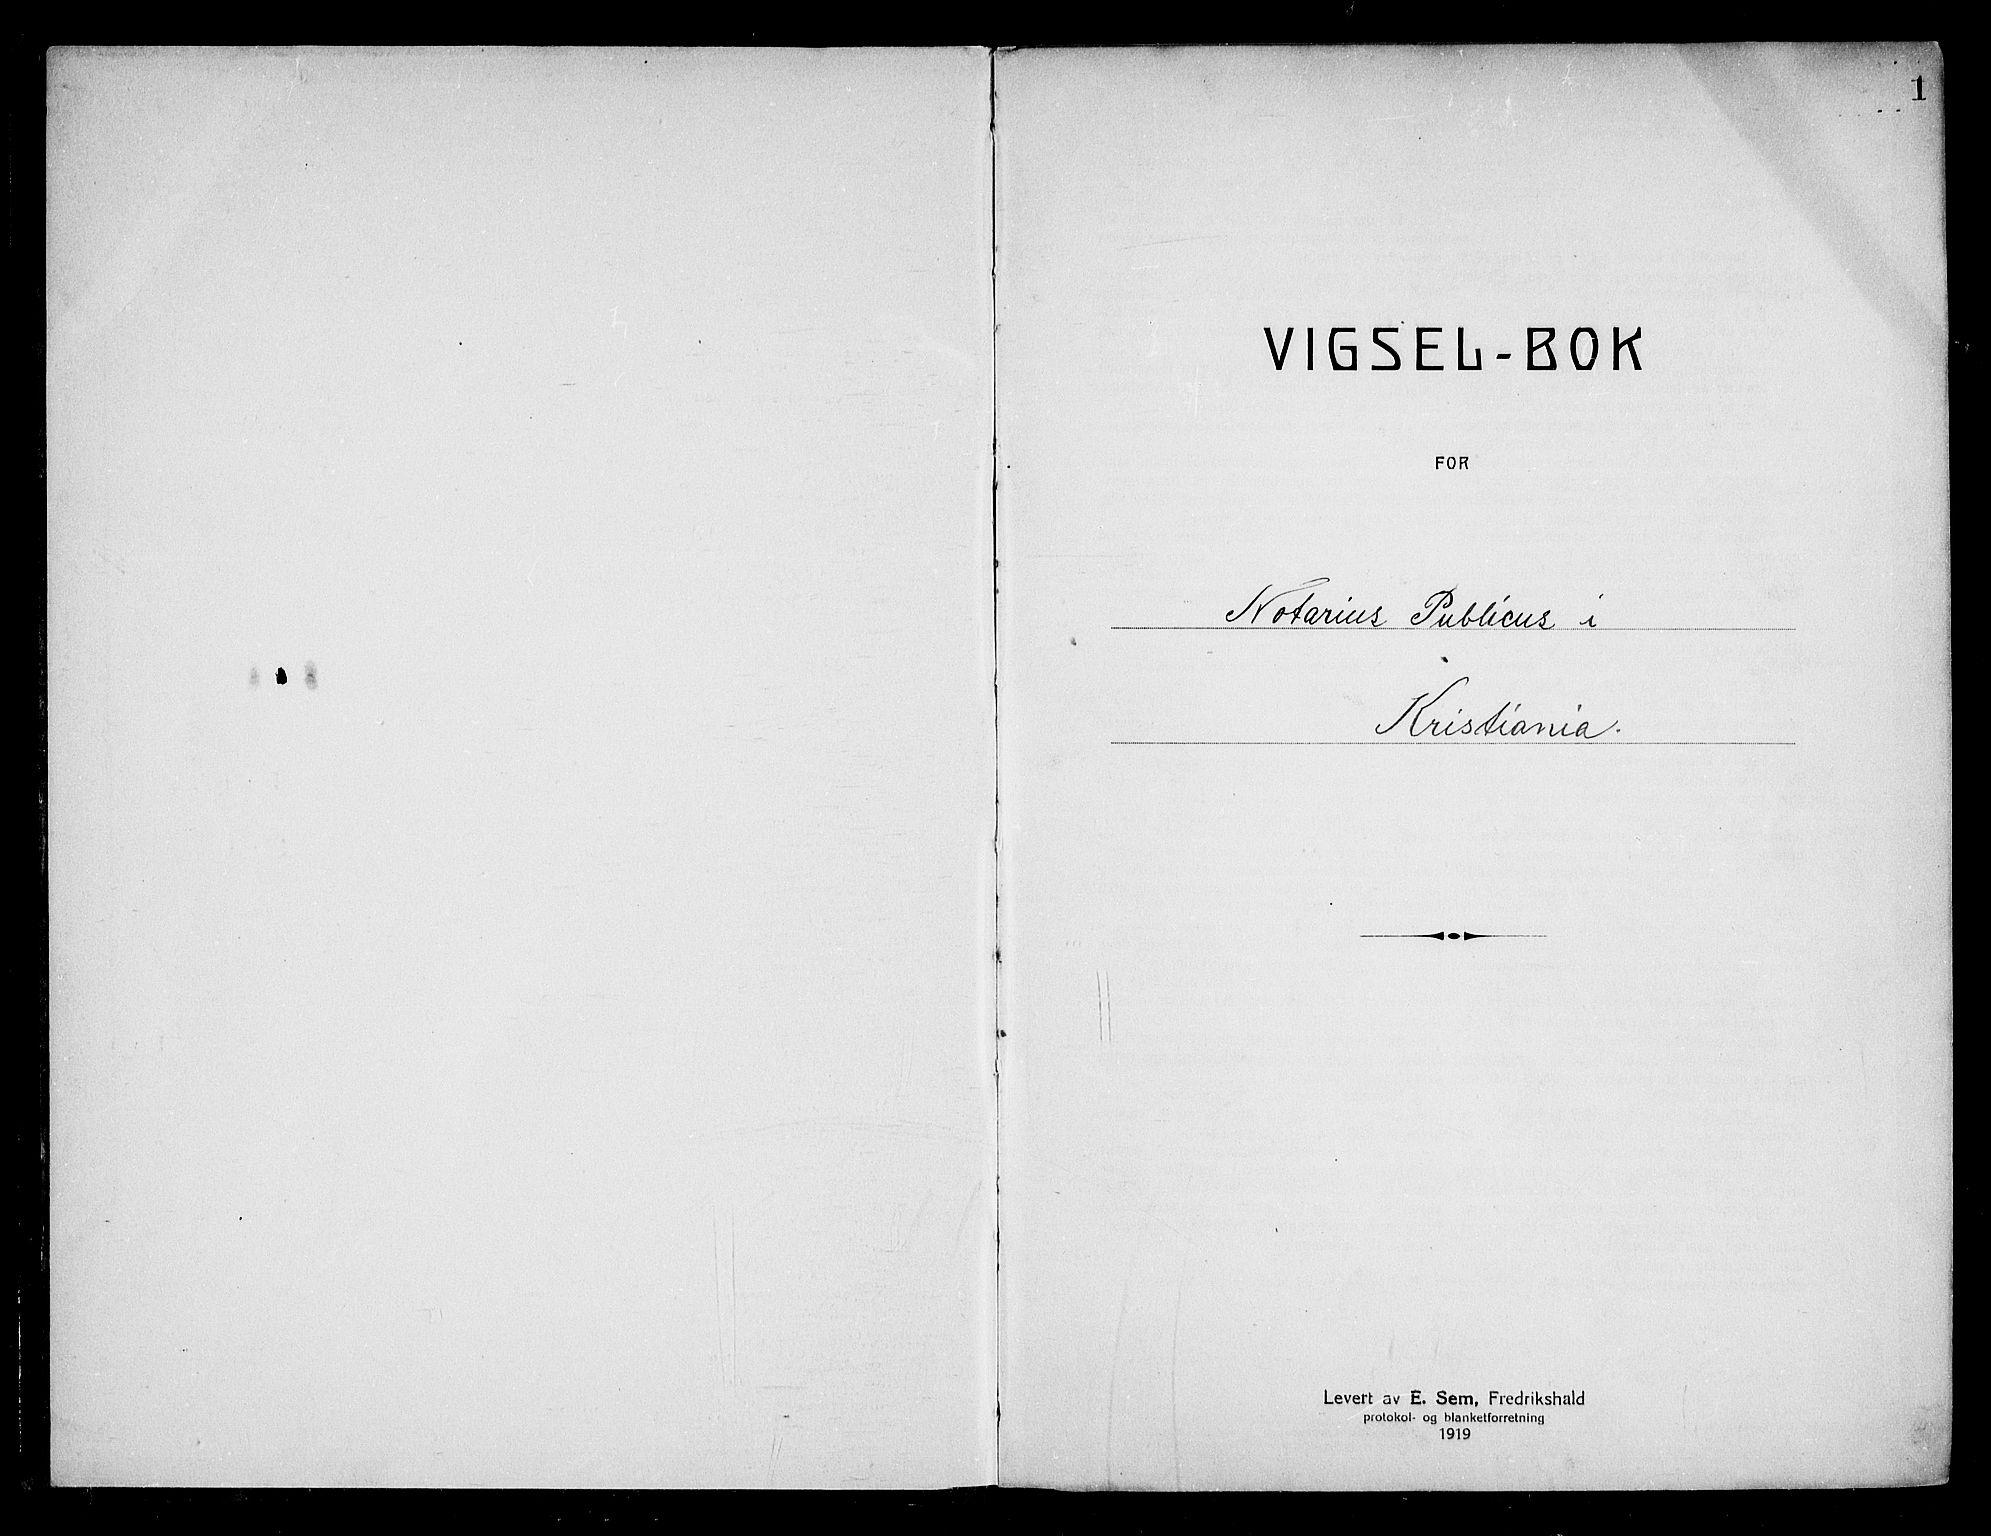 SAO, Oslo byfogd avd. I, L/Lb/Lbb/L0017: Notarialprotokoll, rekke II: Vigsler, 1924-1926, s. 1a